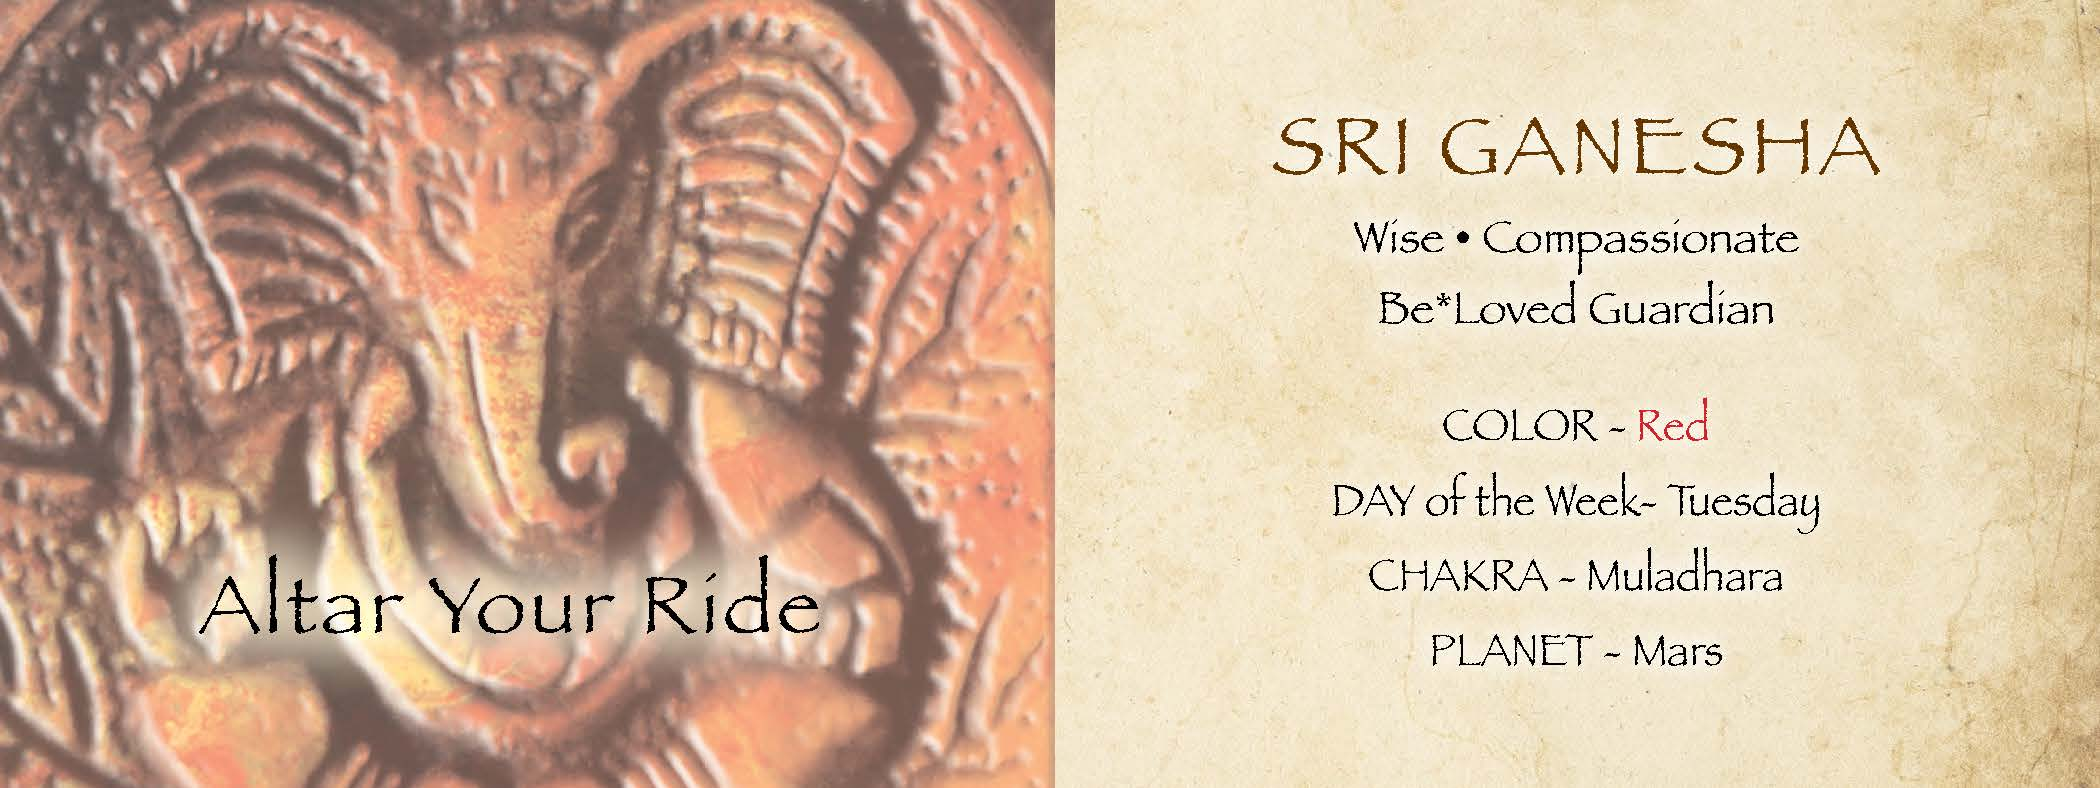 Ganesh final book2_Page_2.jpg